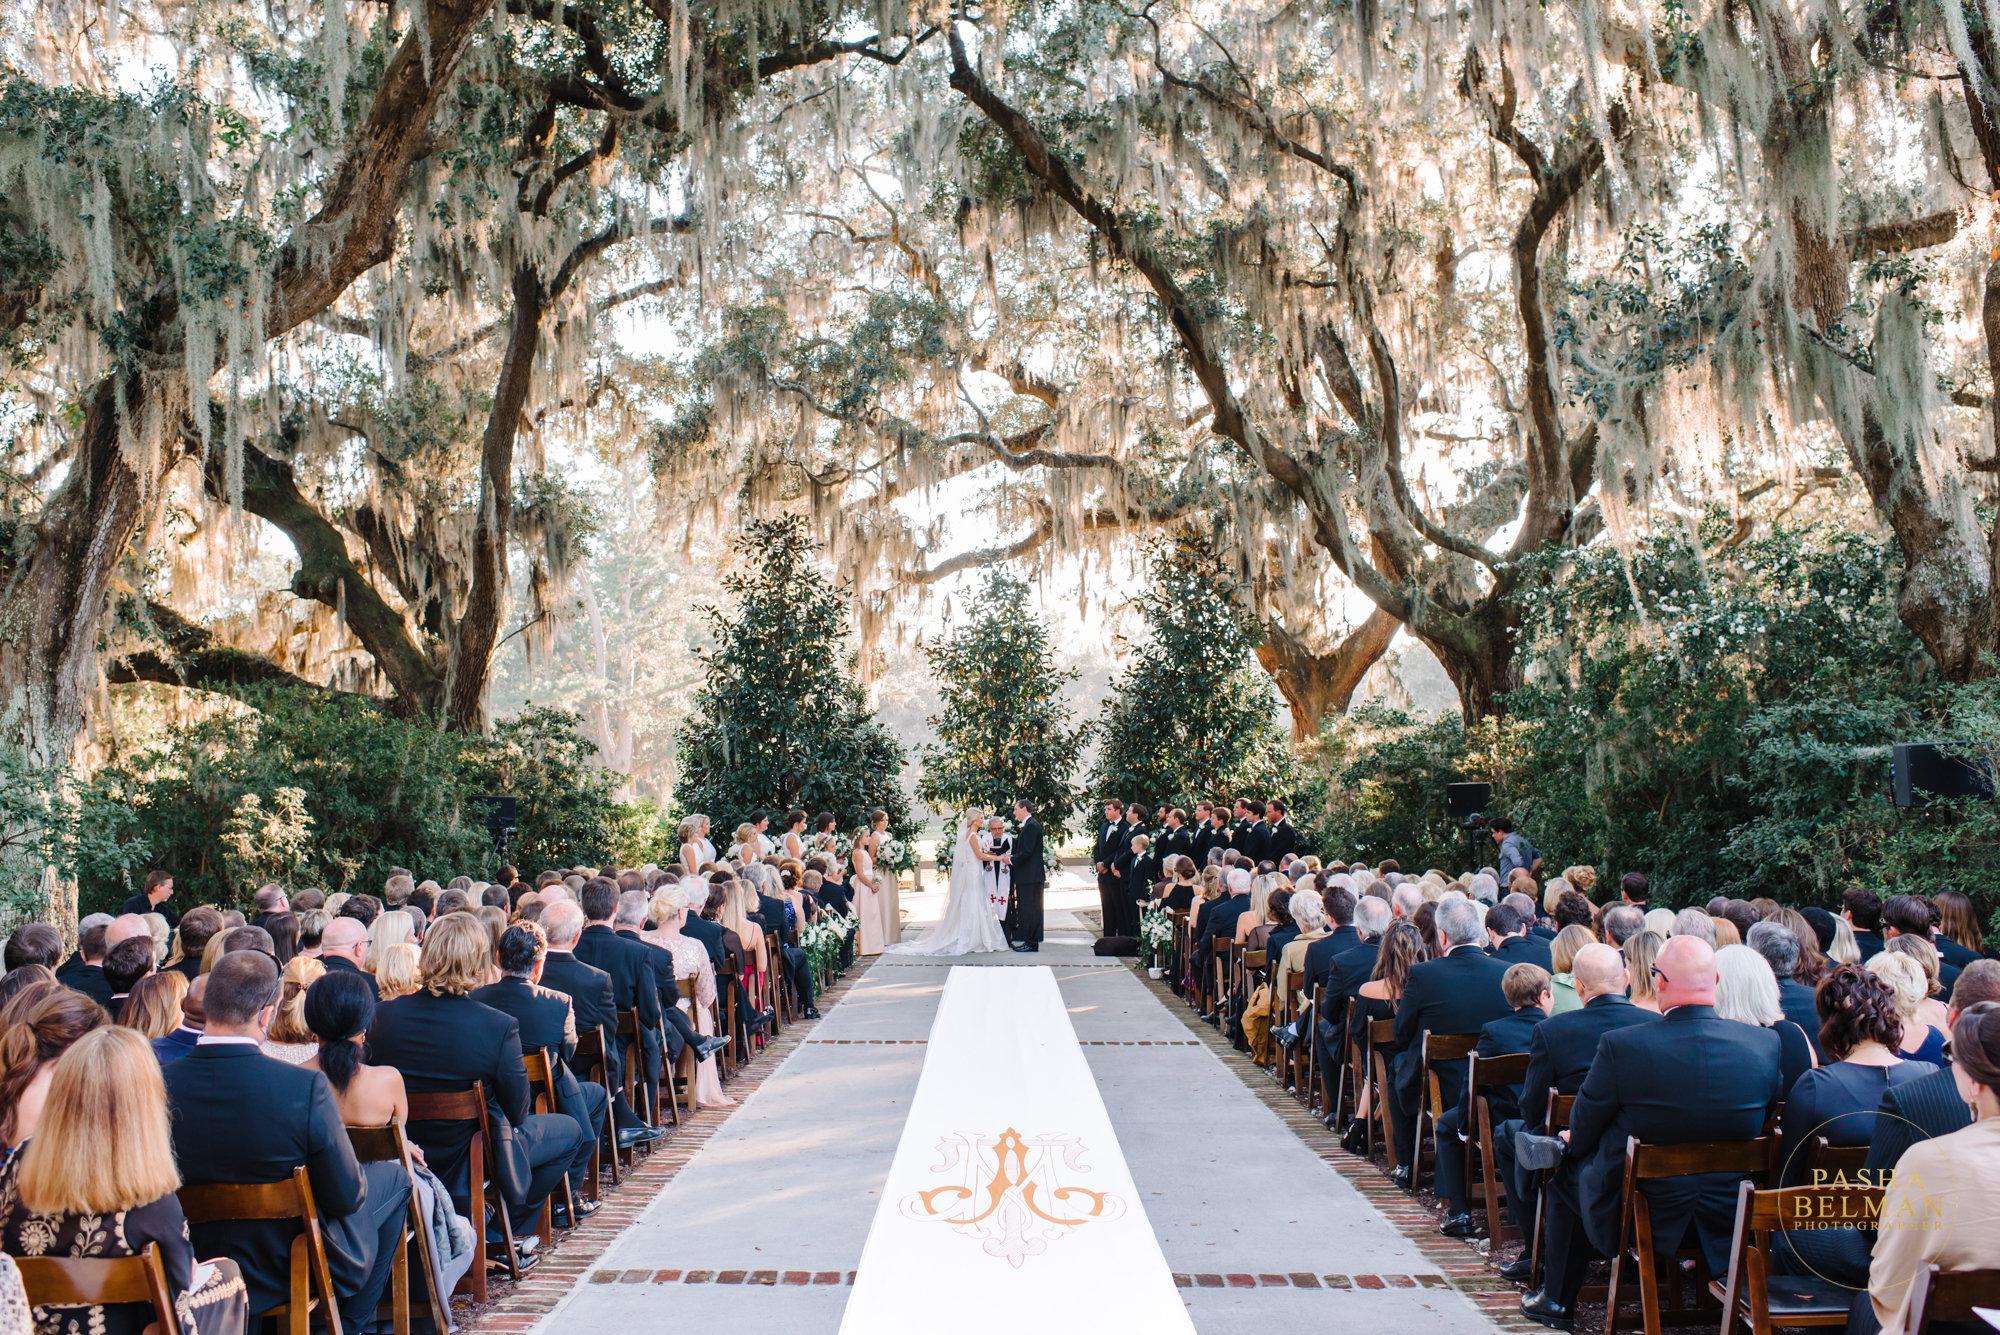 Myrtle Beach Wedding Photography - Top Wedding Photographers in Myrtle Beach and Charleston SC